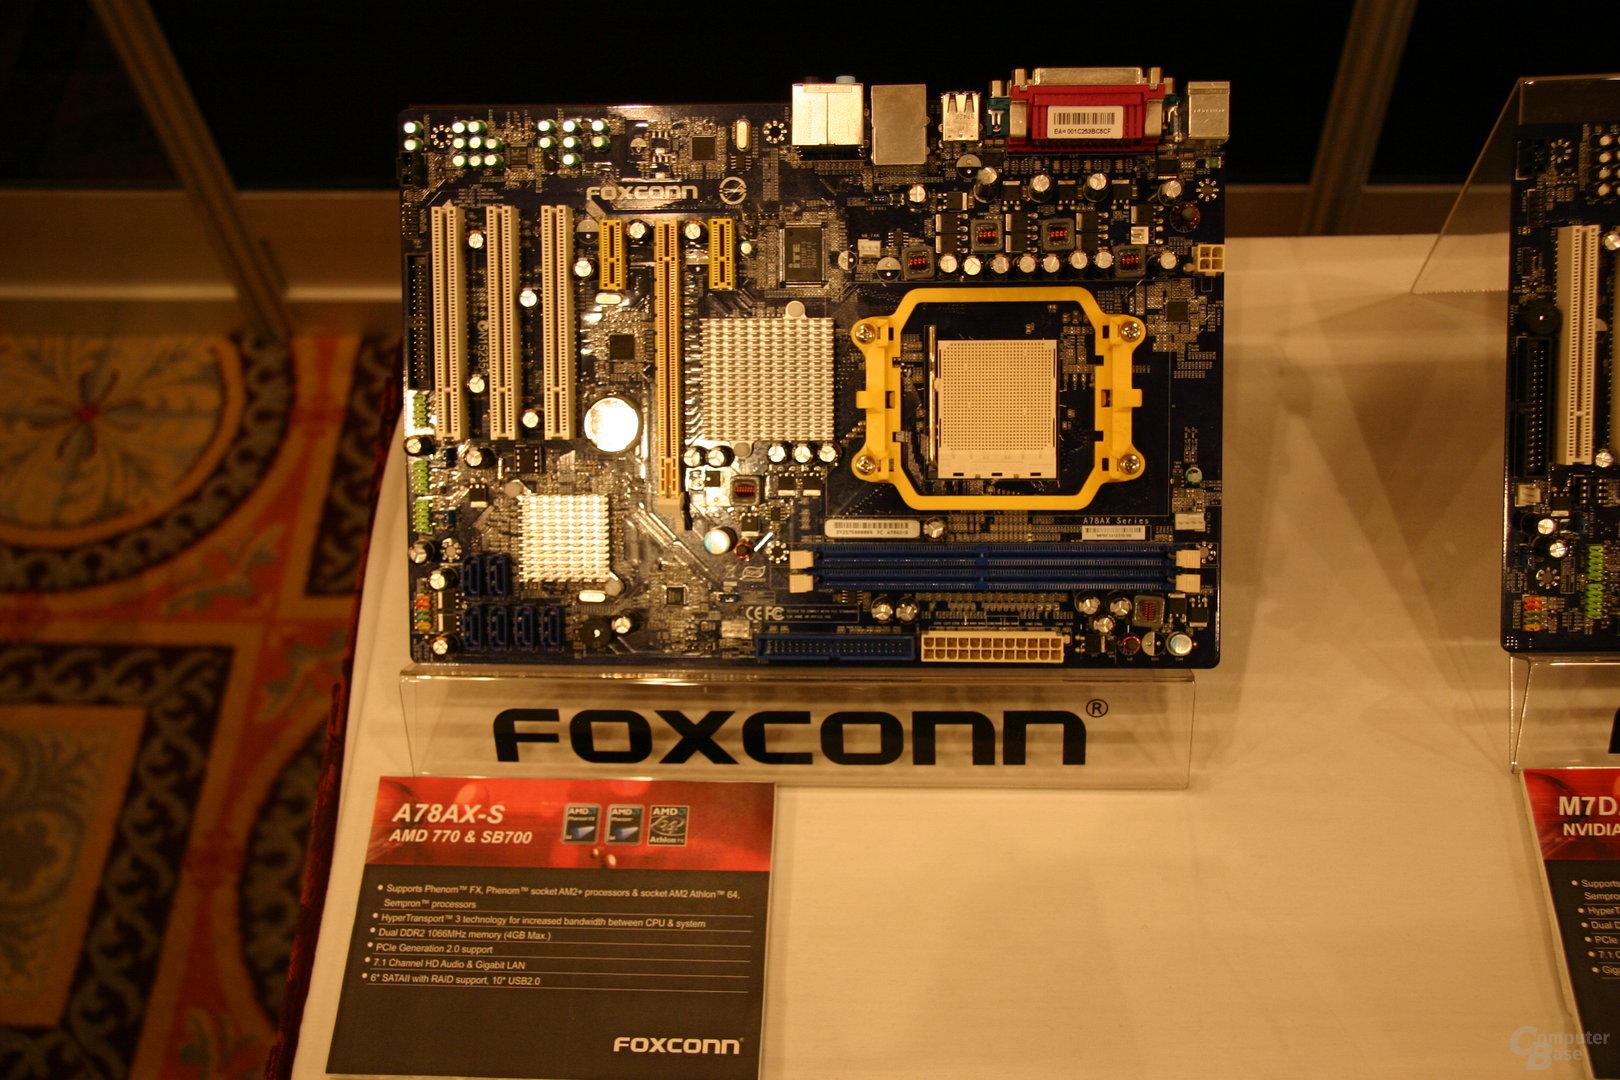 AMD 770